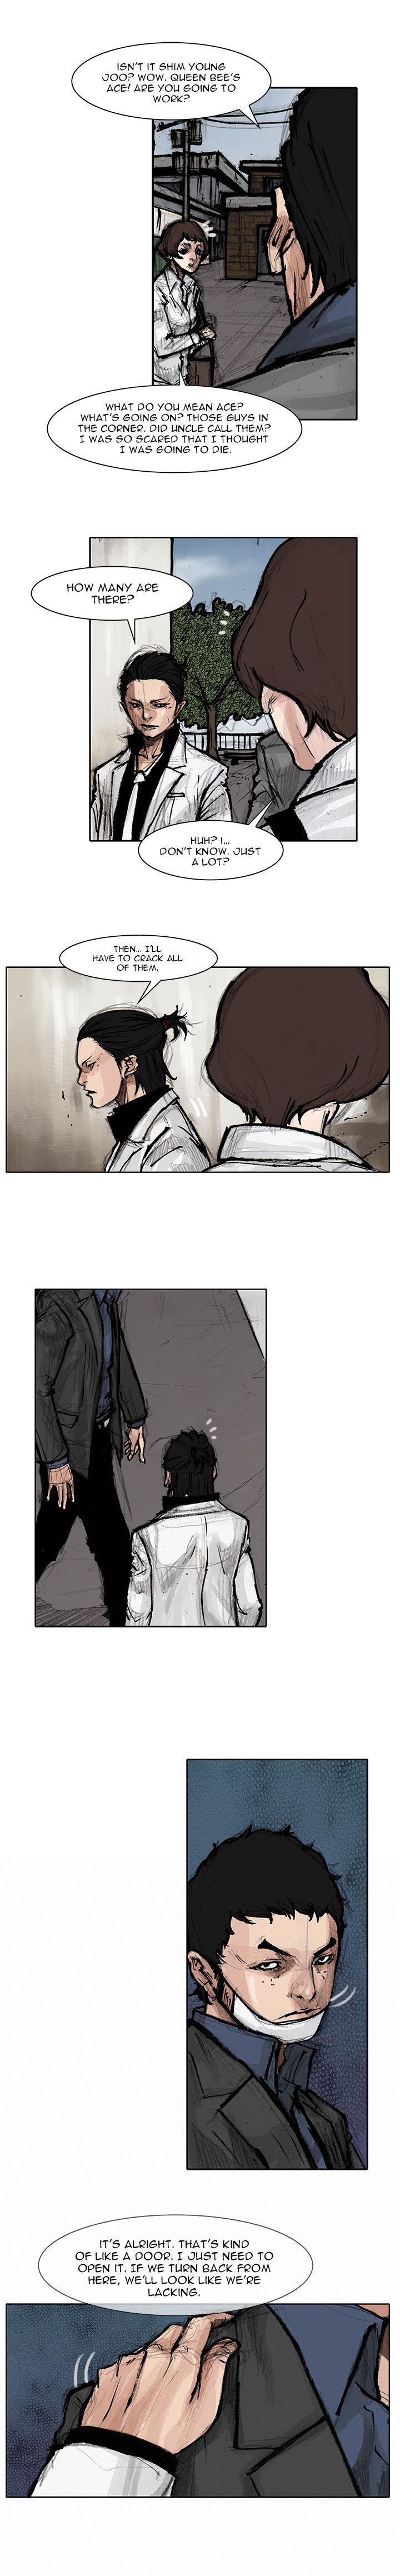 Tong - Chapter 57